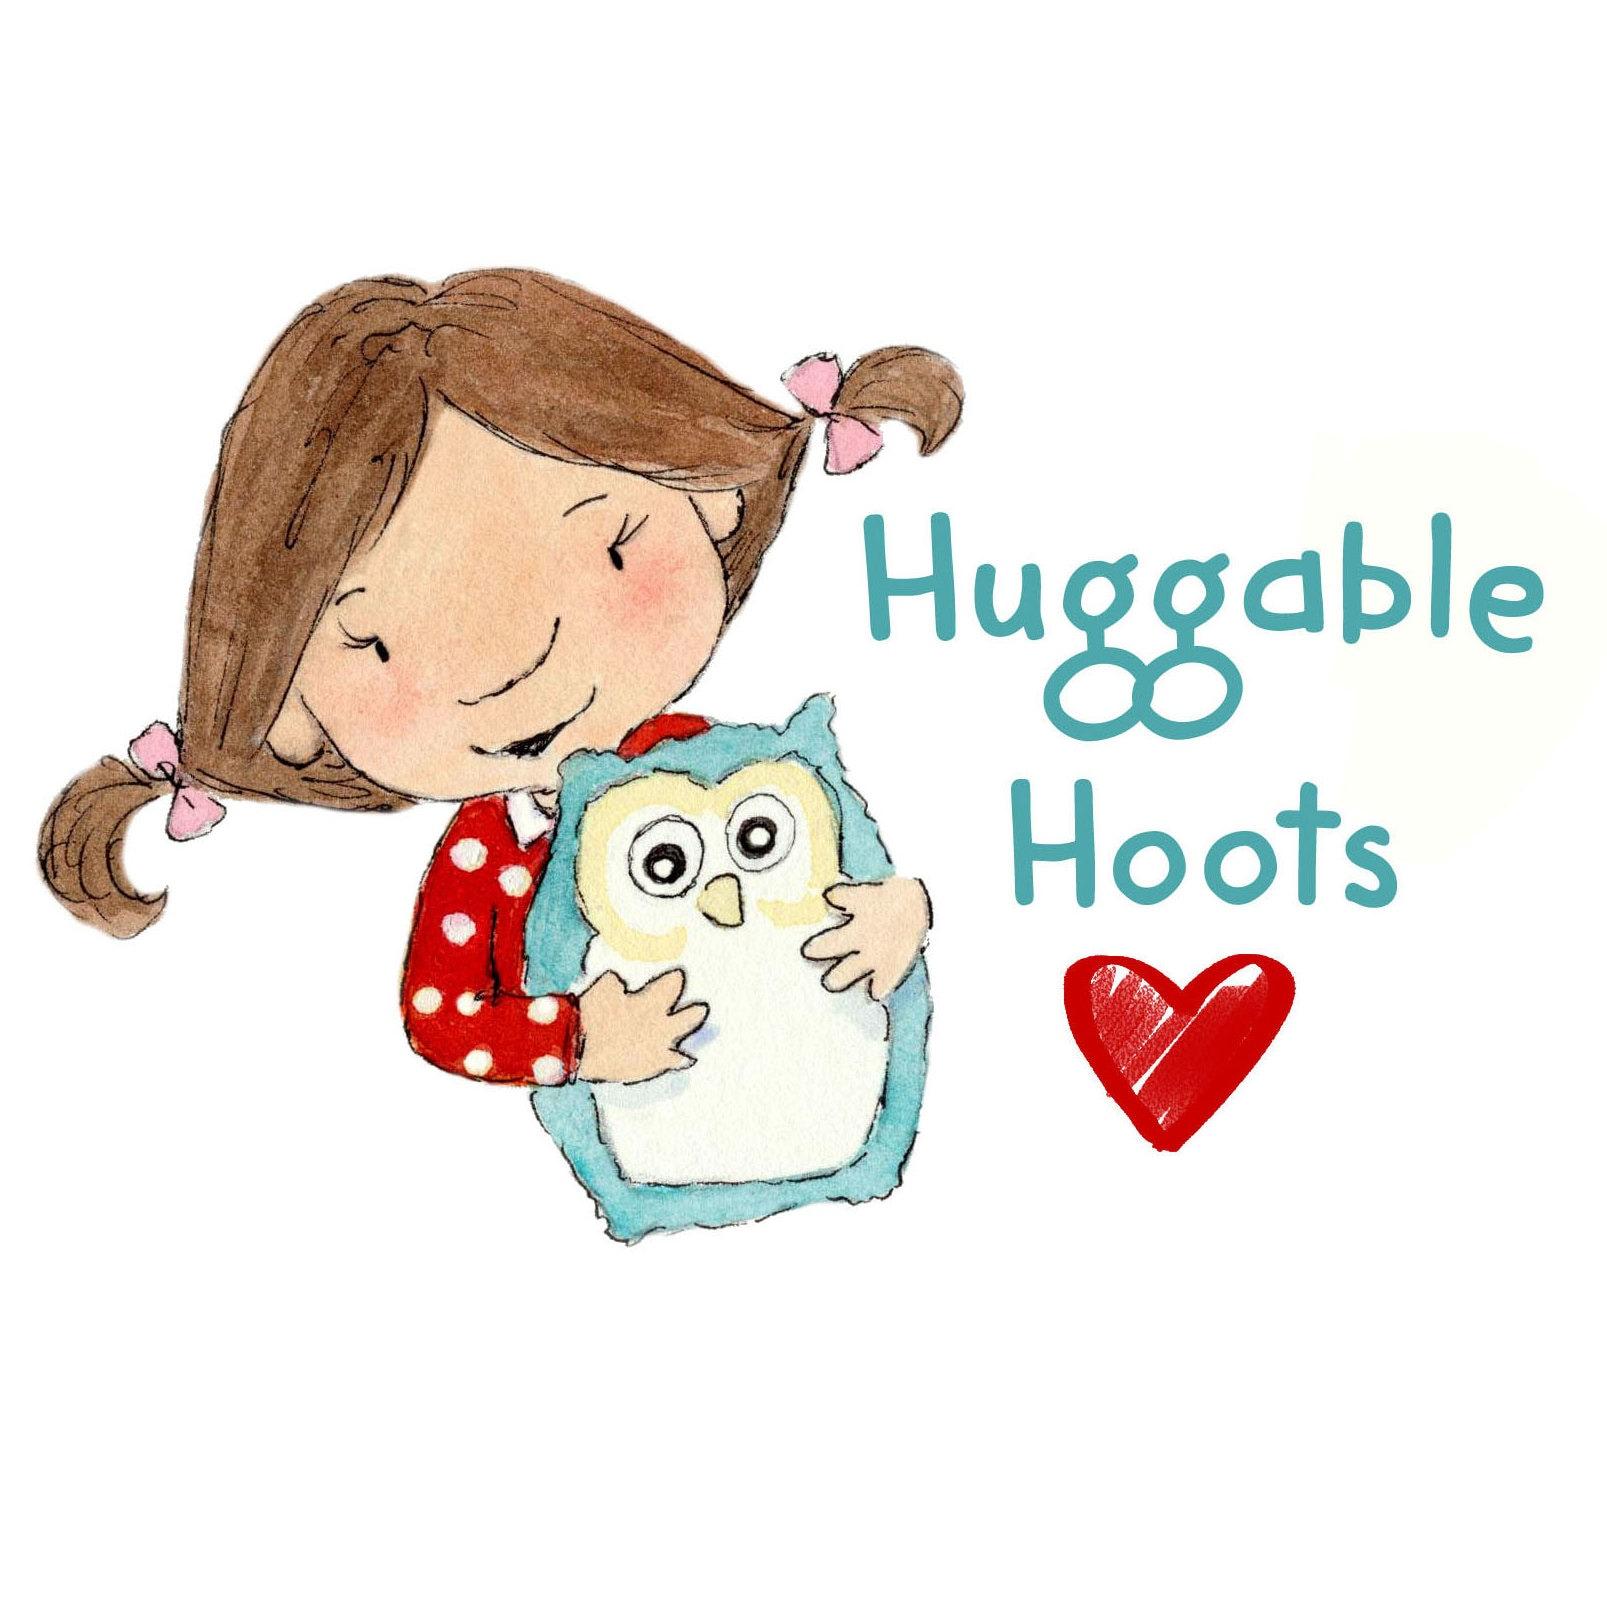 TheHuggableHoots